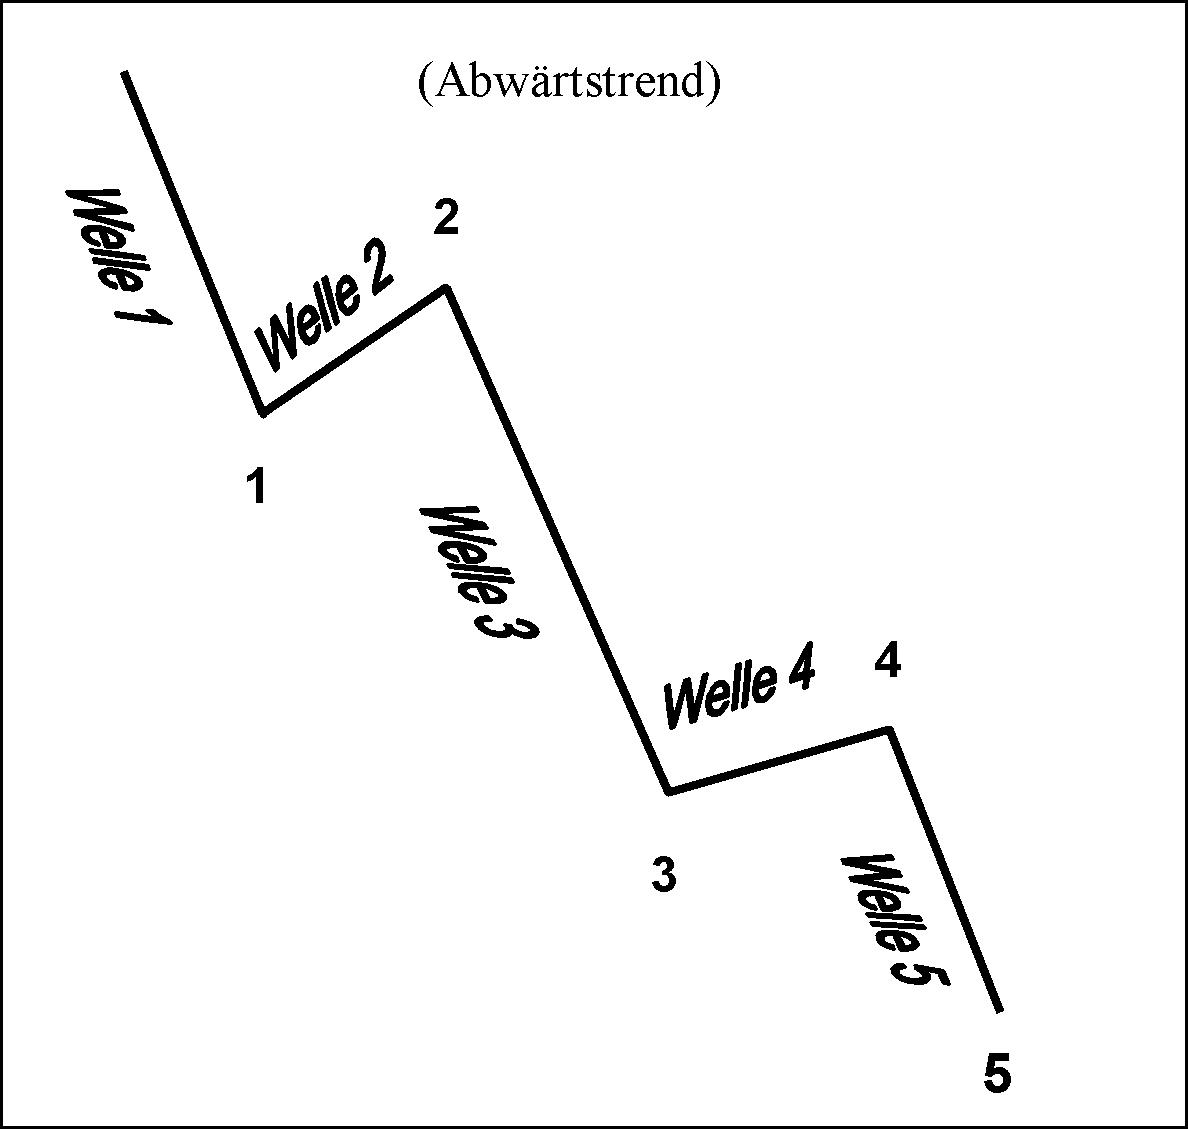 Impulsives-DAX-Trading-mit-Hilfe-der-Elliott-Wellen-Theorie-André-Tiedje-GodmodeTrader.de-2